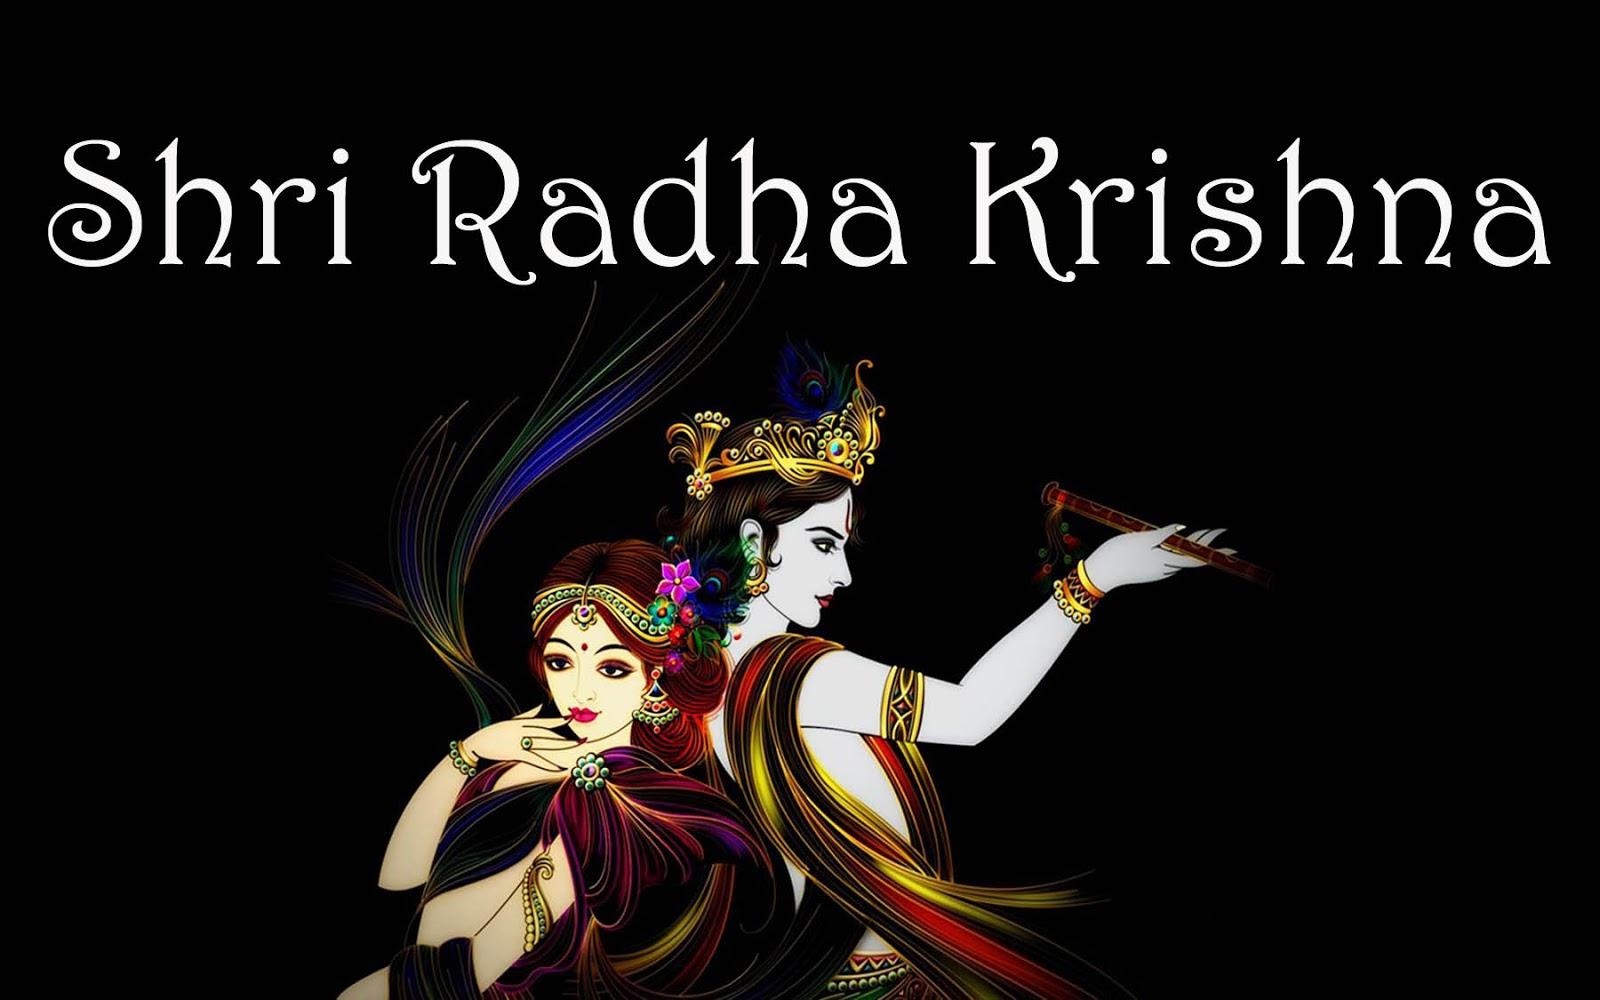 God Quotes Hd Wallpaper Radha Krishna 3d Effects Hd Wallpapers God Wallpaper Photos